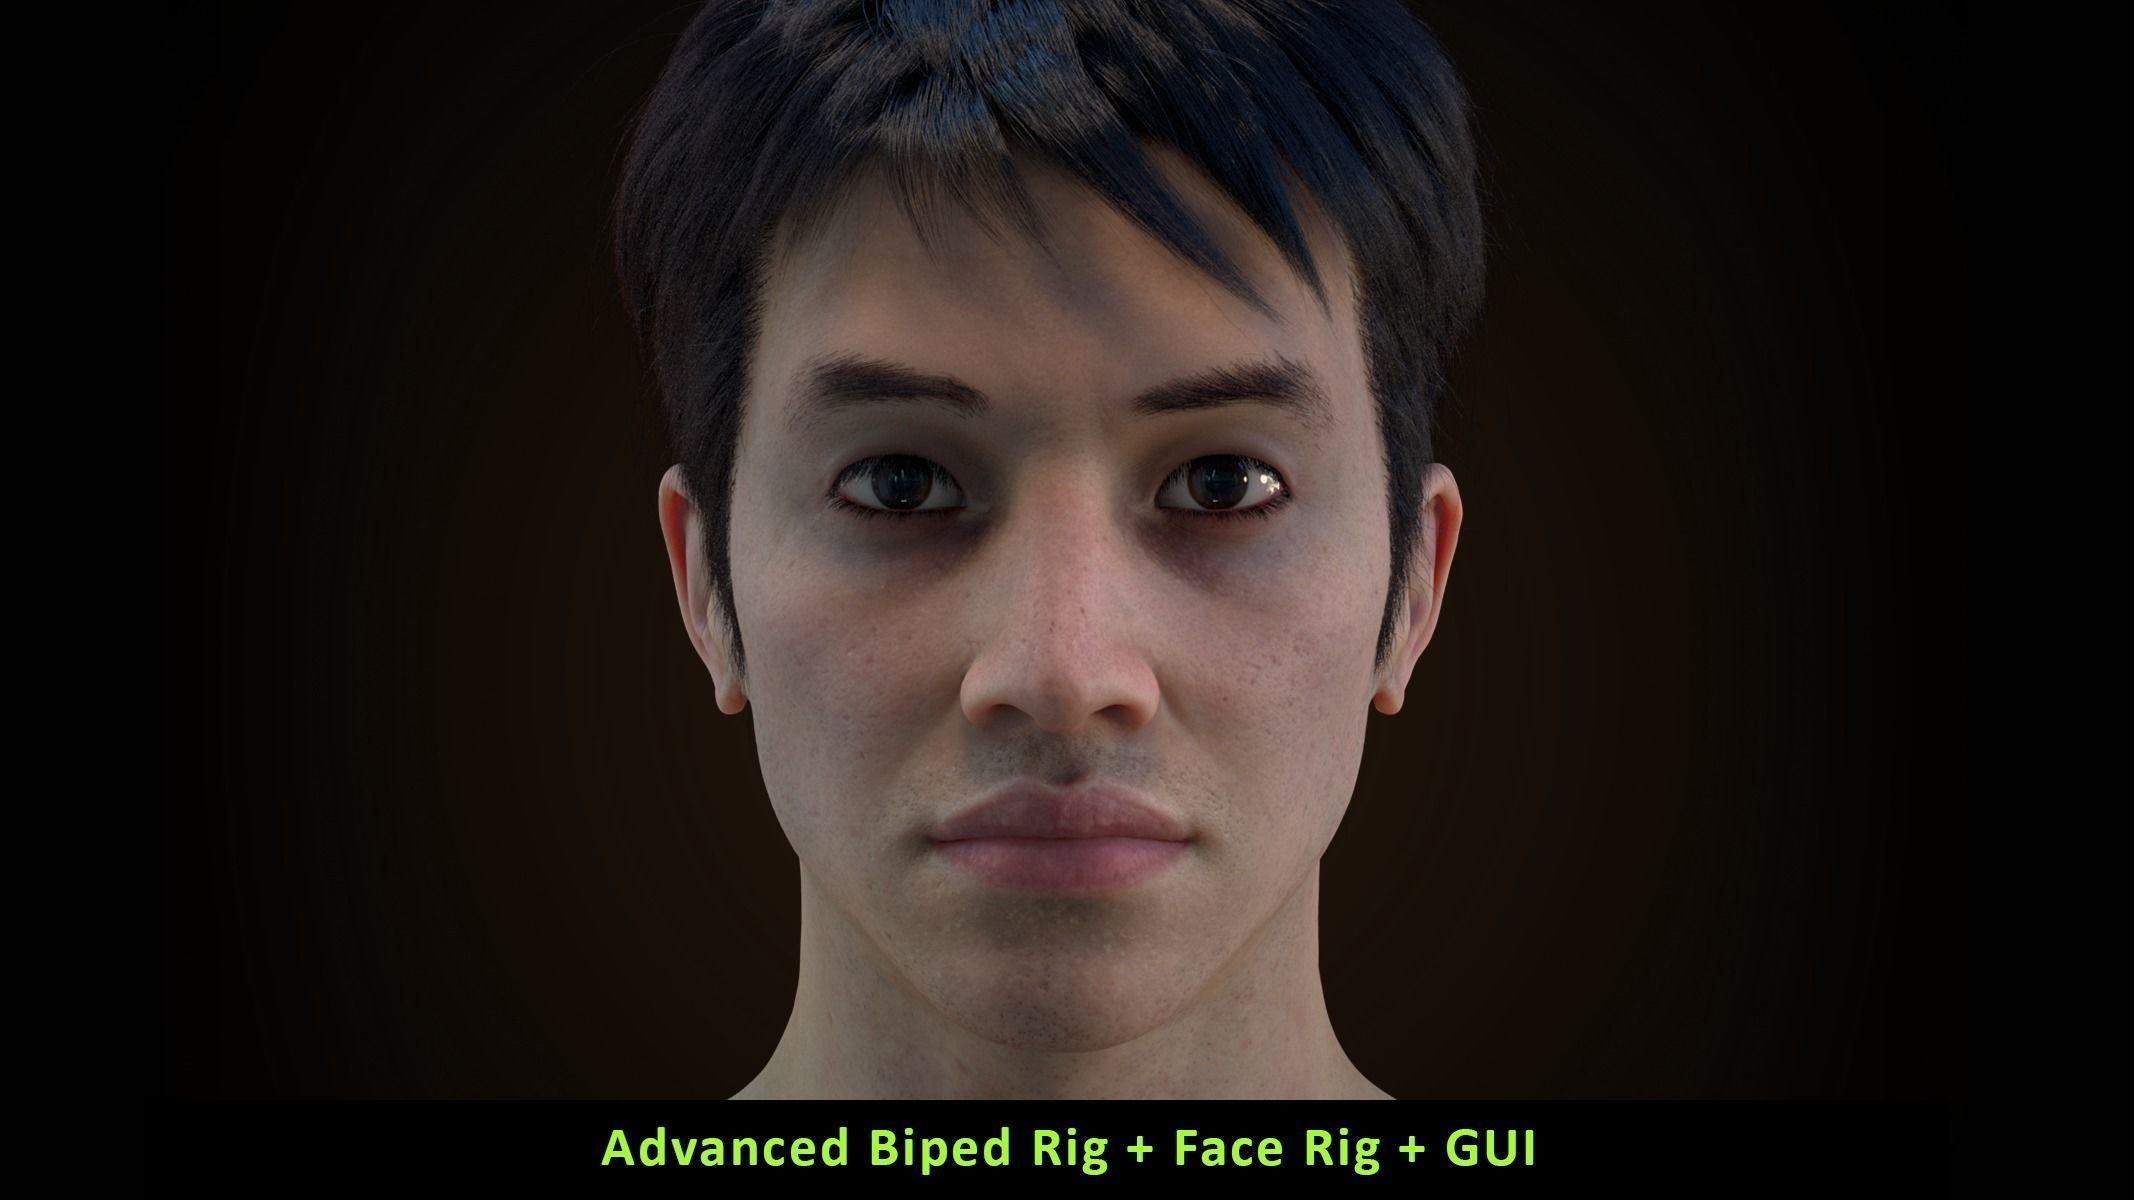 Cinematic Male 003 - Advanced Body Rig - Face Rig - GUI